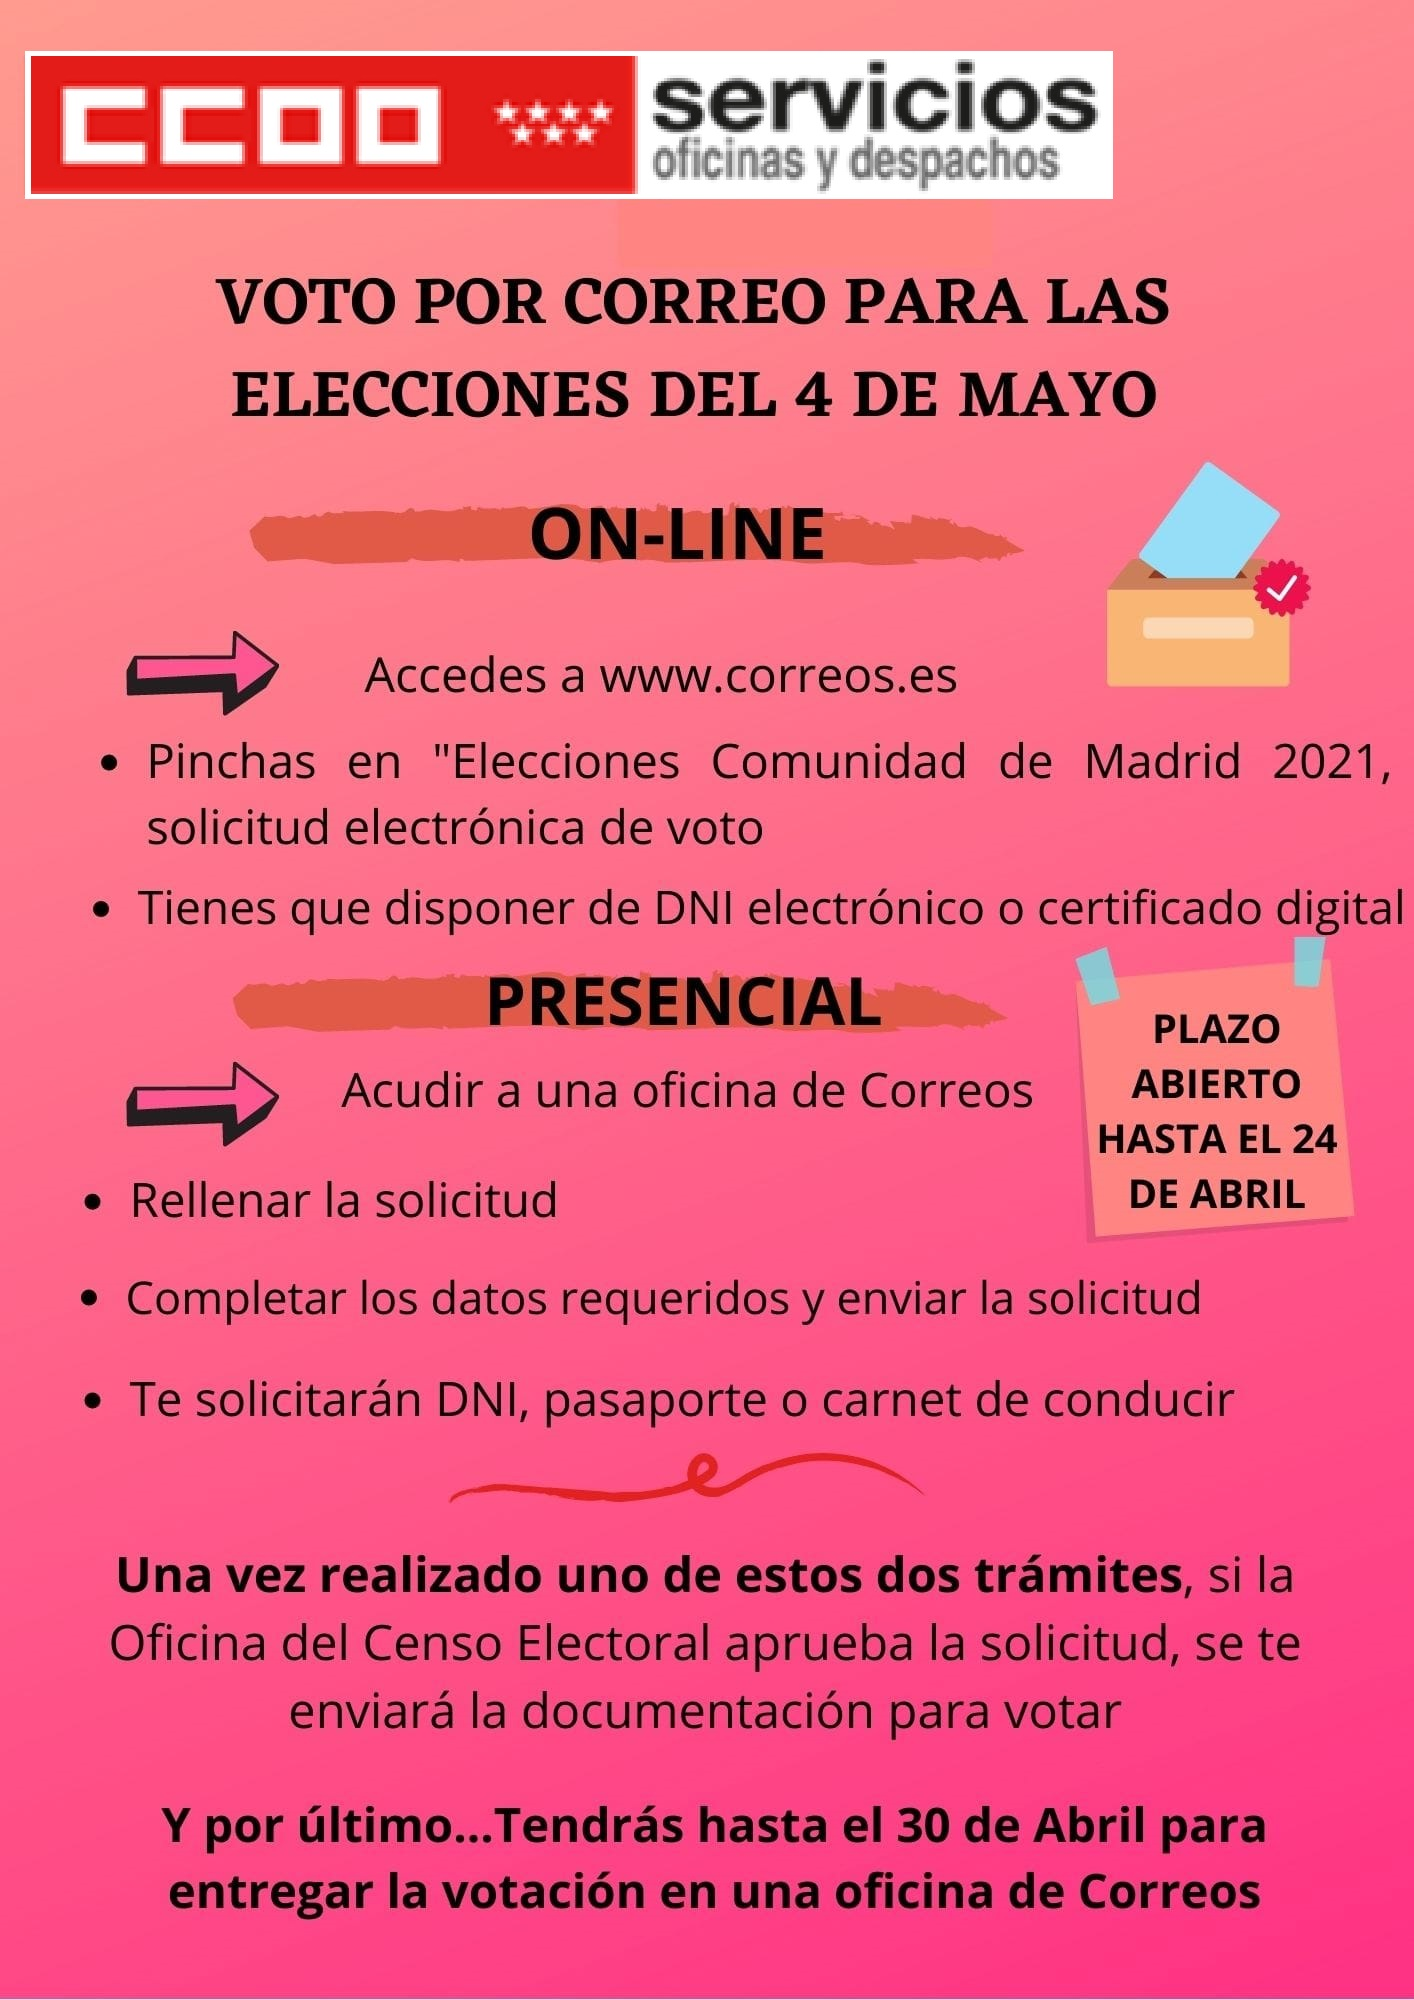 voto por correo 4mayo